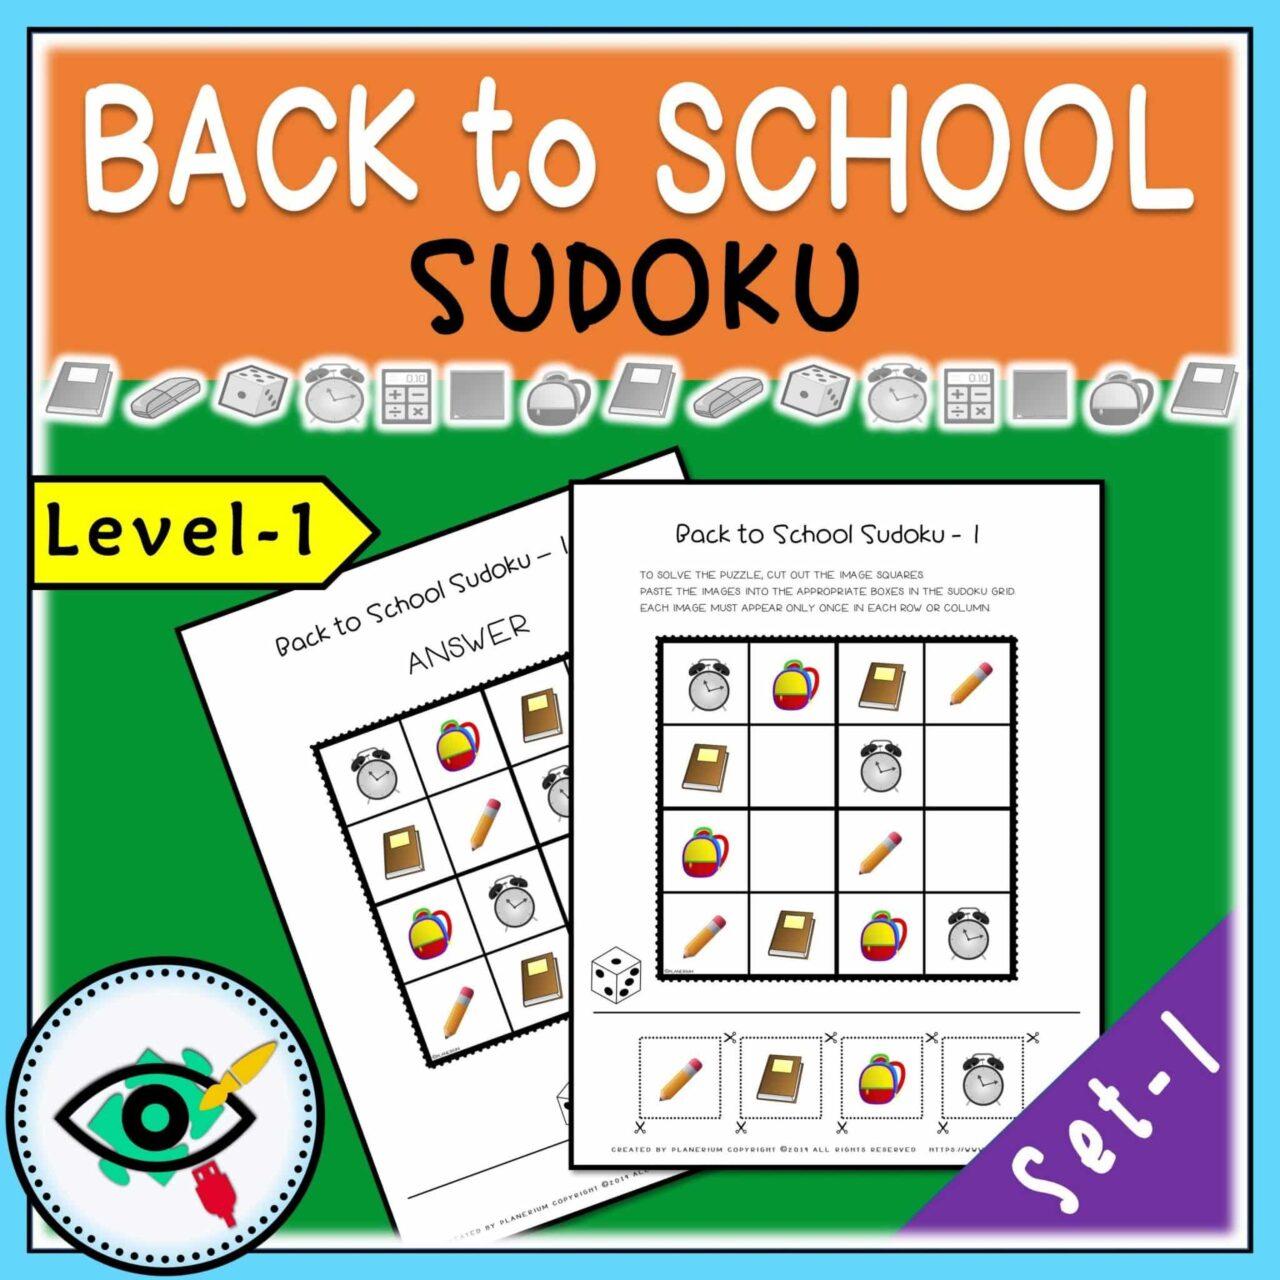 Back to School - Sudoku - Title 1 | Planerium